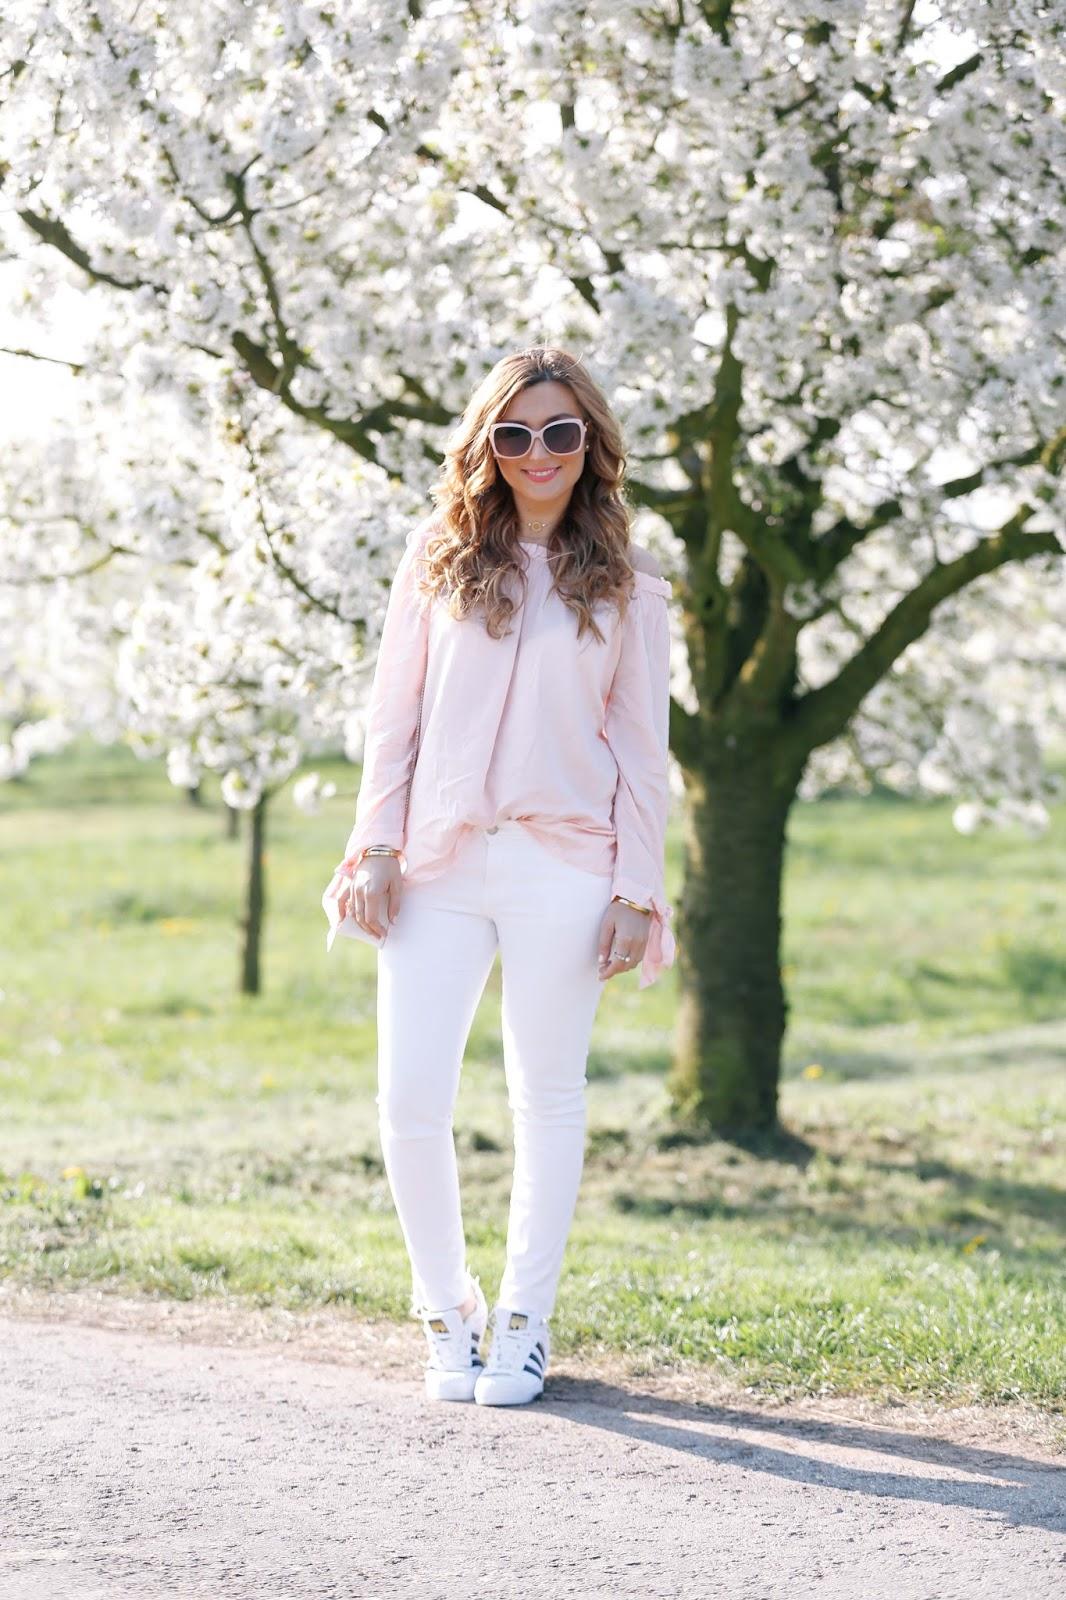 MyColloseum-Deutsche-Fashionblogger-Blogger-aus-Deutschland-Deutsche-fashionblogger-Fashionstylebyjohanna